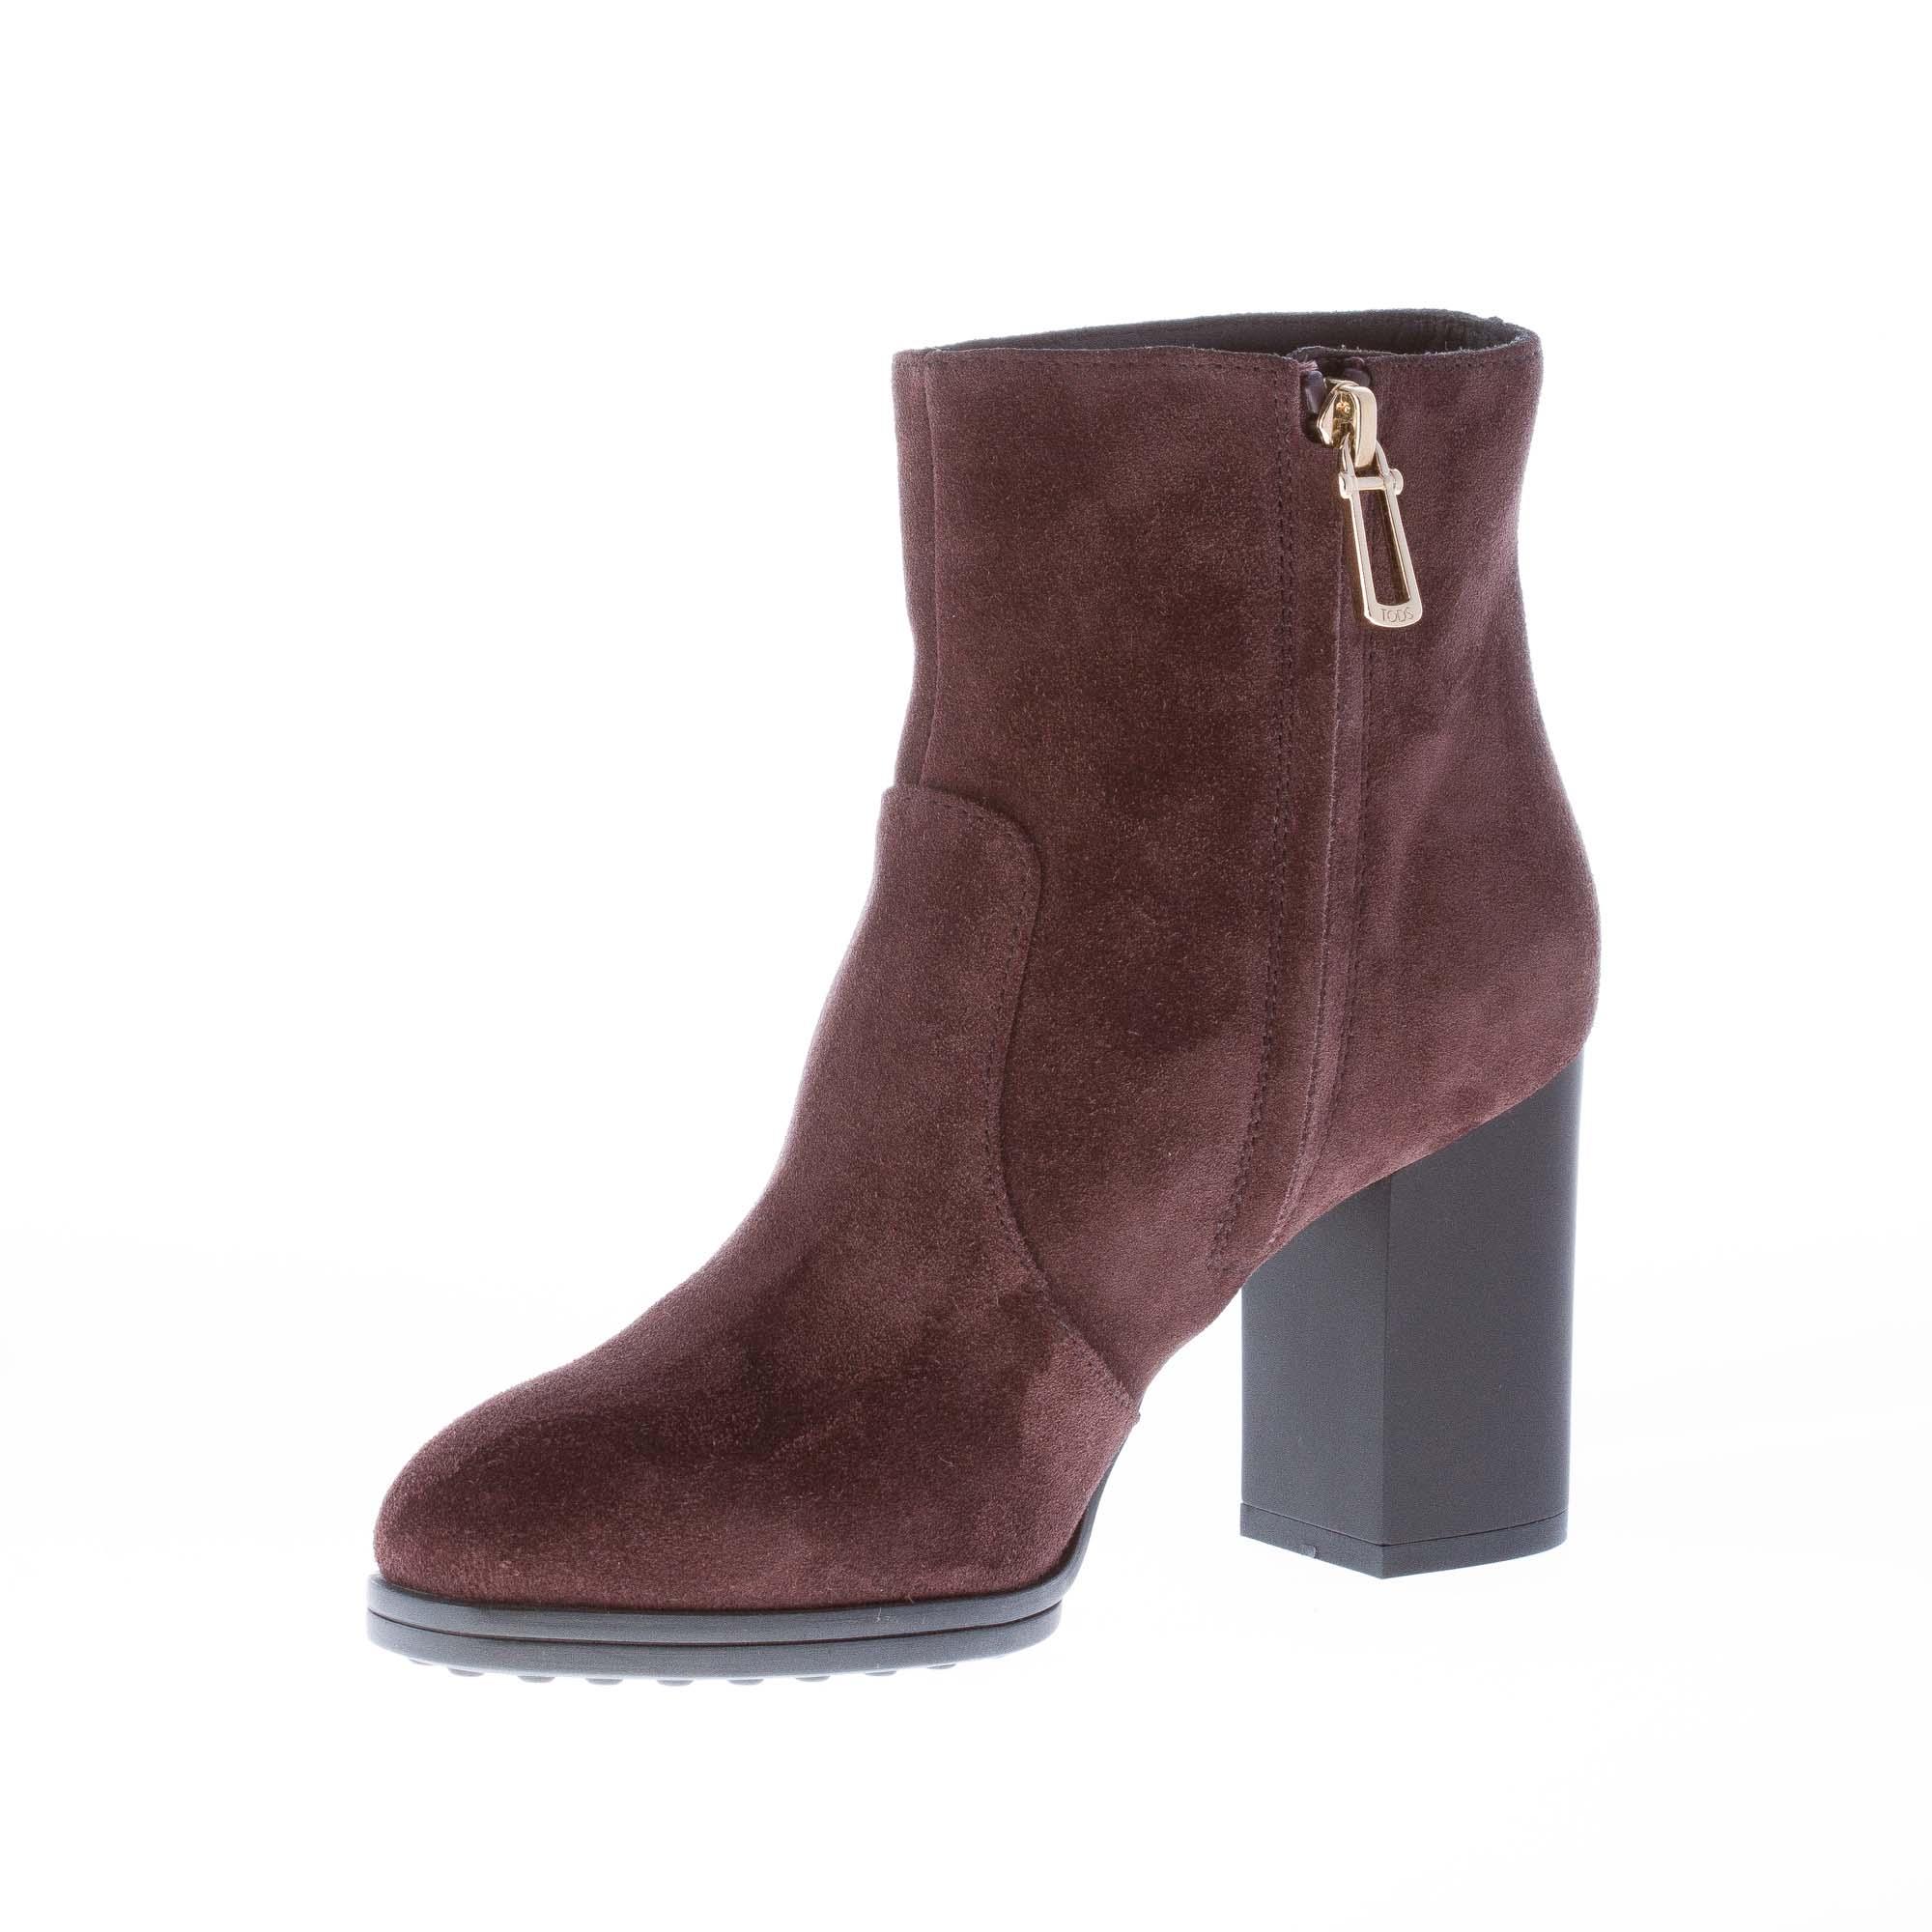 TOD'S Boots Dark brown Women